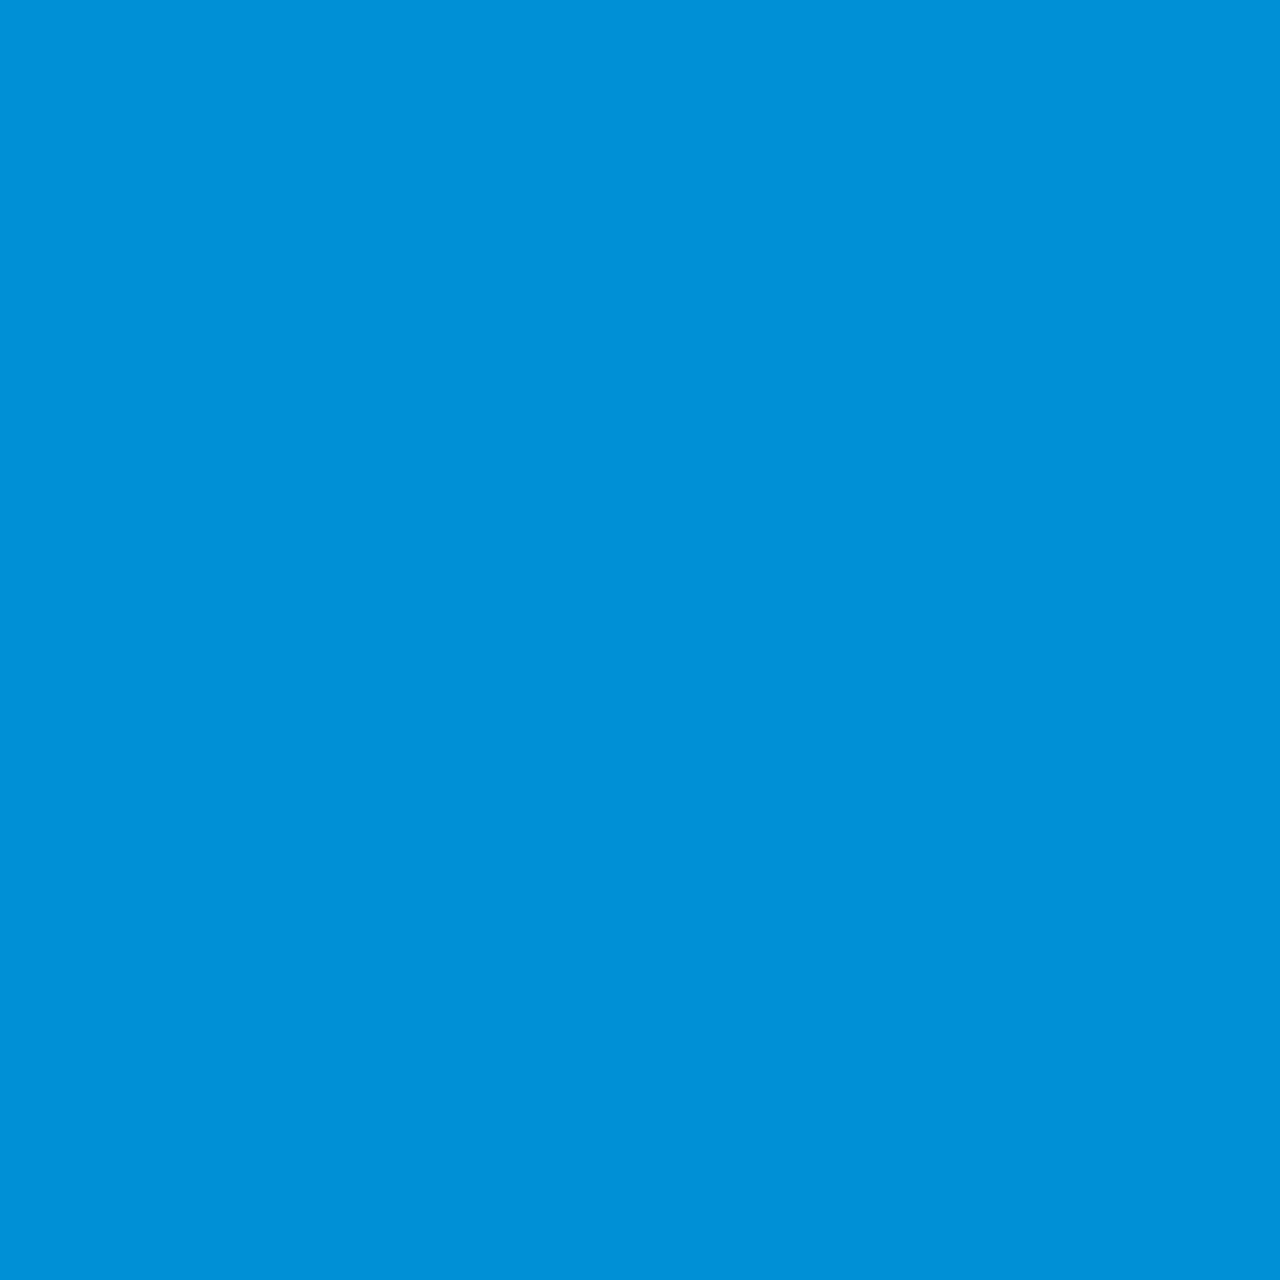 "#0366 Rosco Gels Roscolux Jordan Blue, 20x24"""